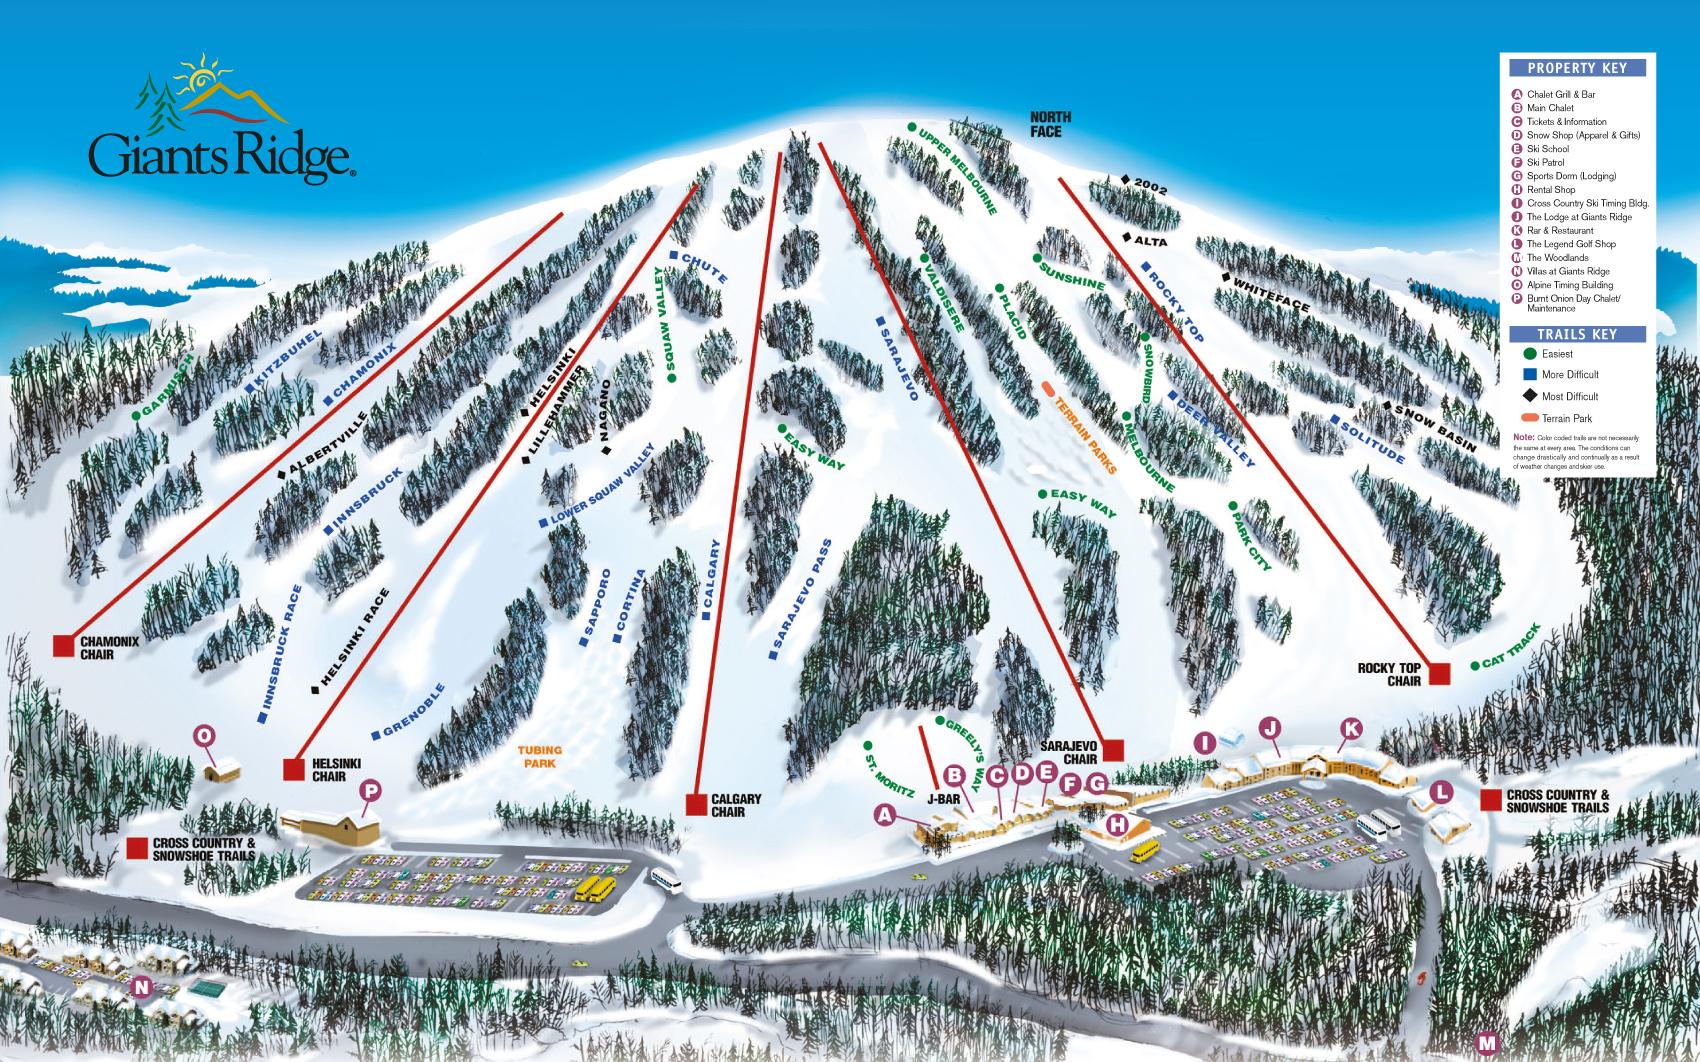 giants ridge scores $5.7 million for new lifts – lift blog